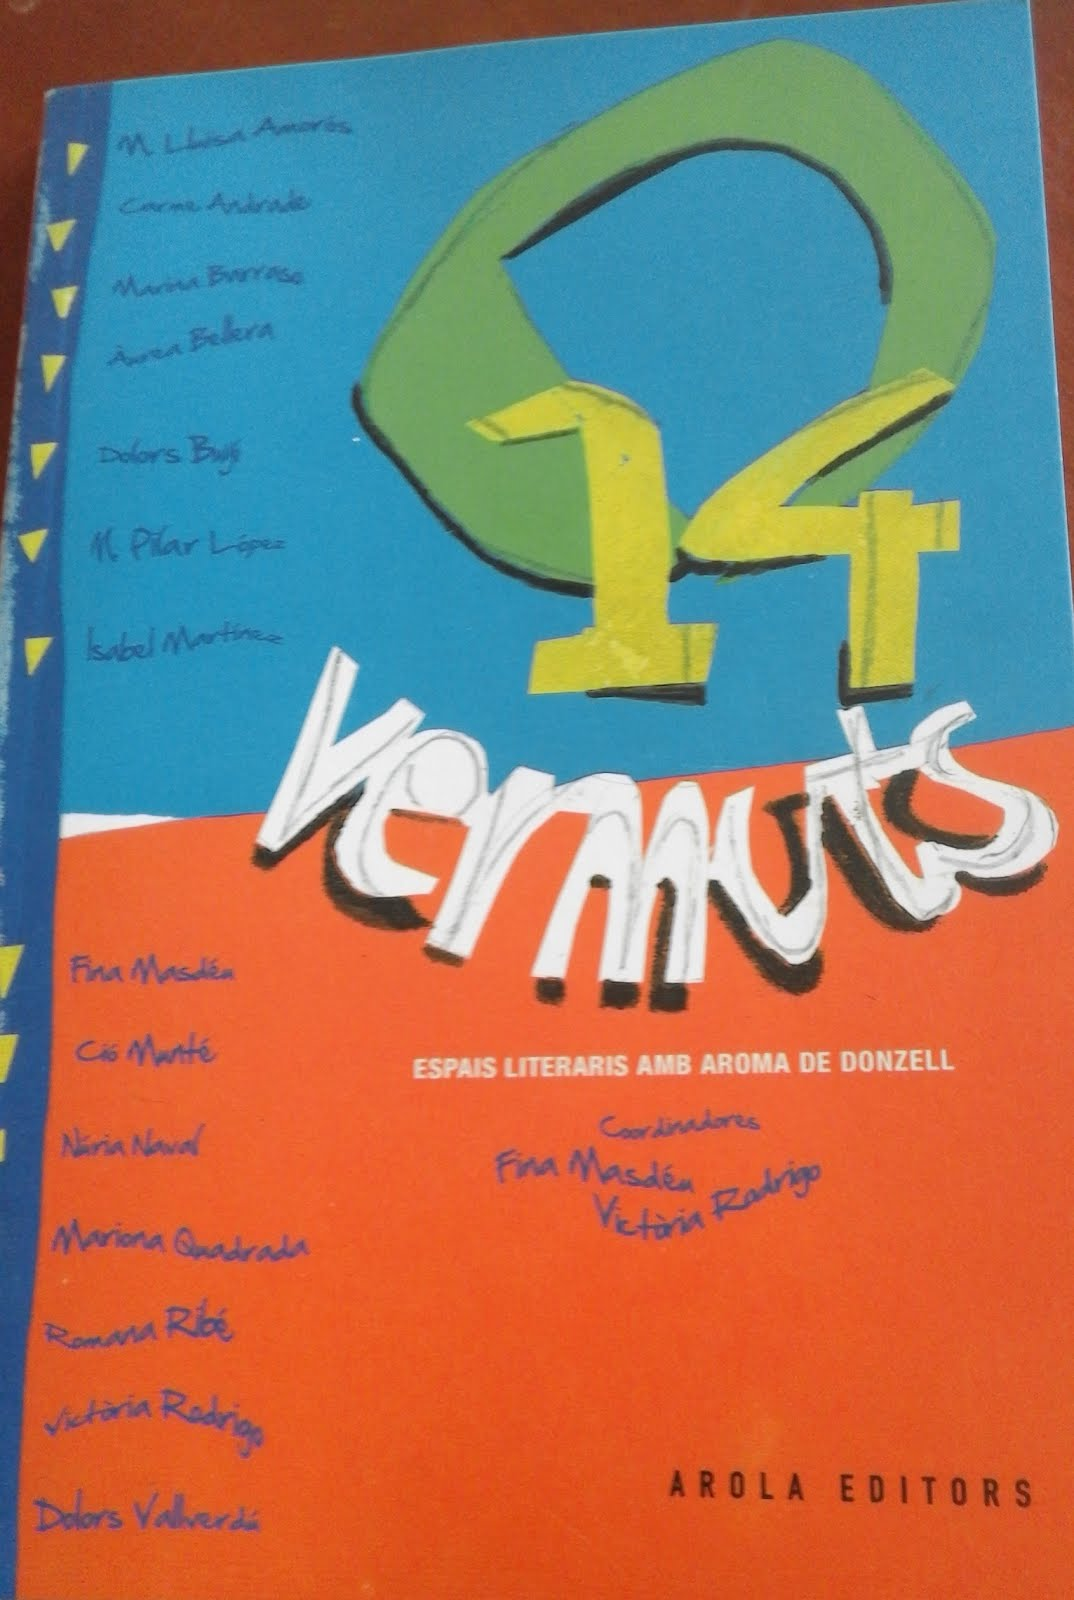 14 vermuts <br>Arola Editors, 2016